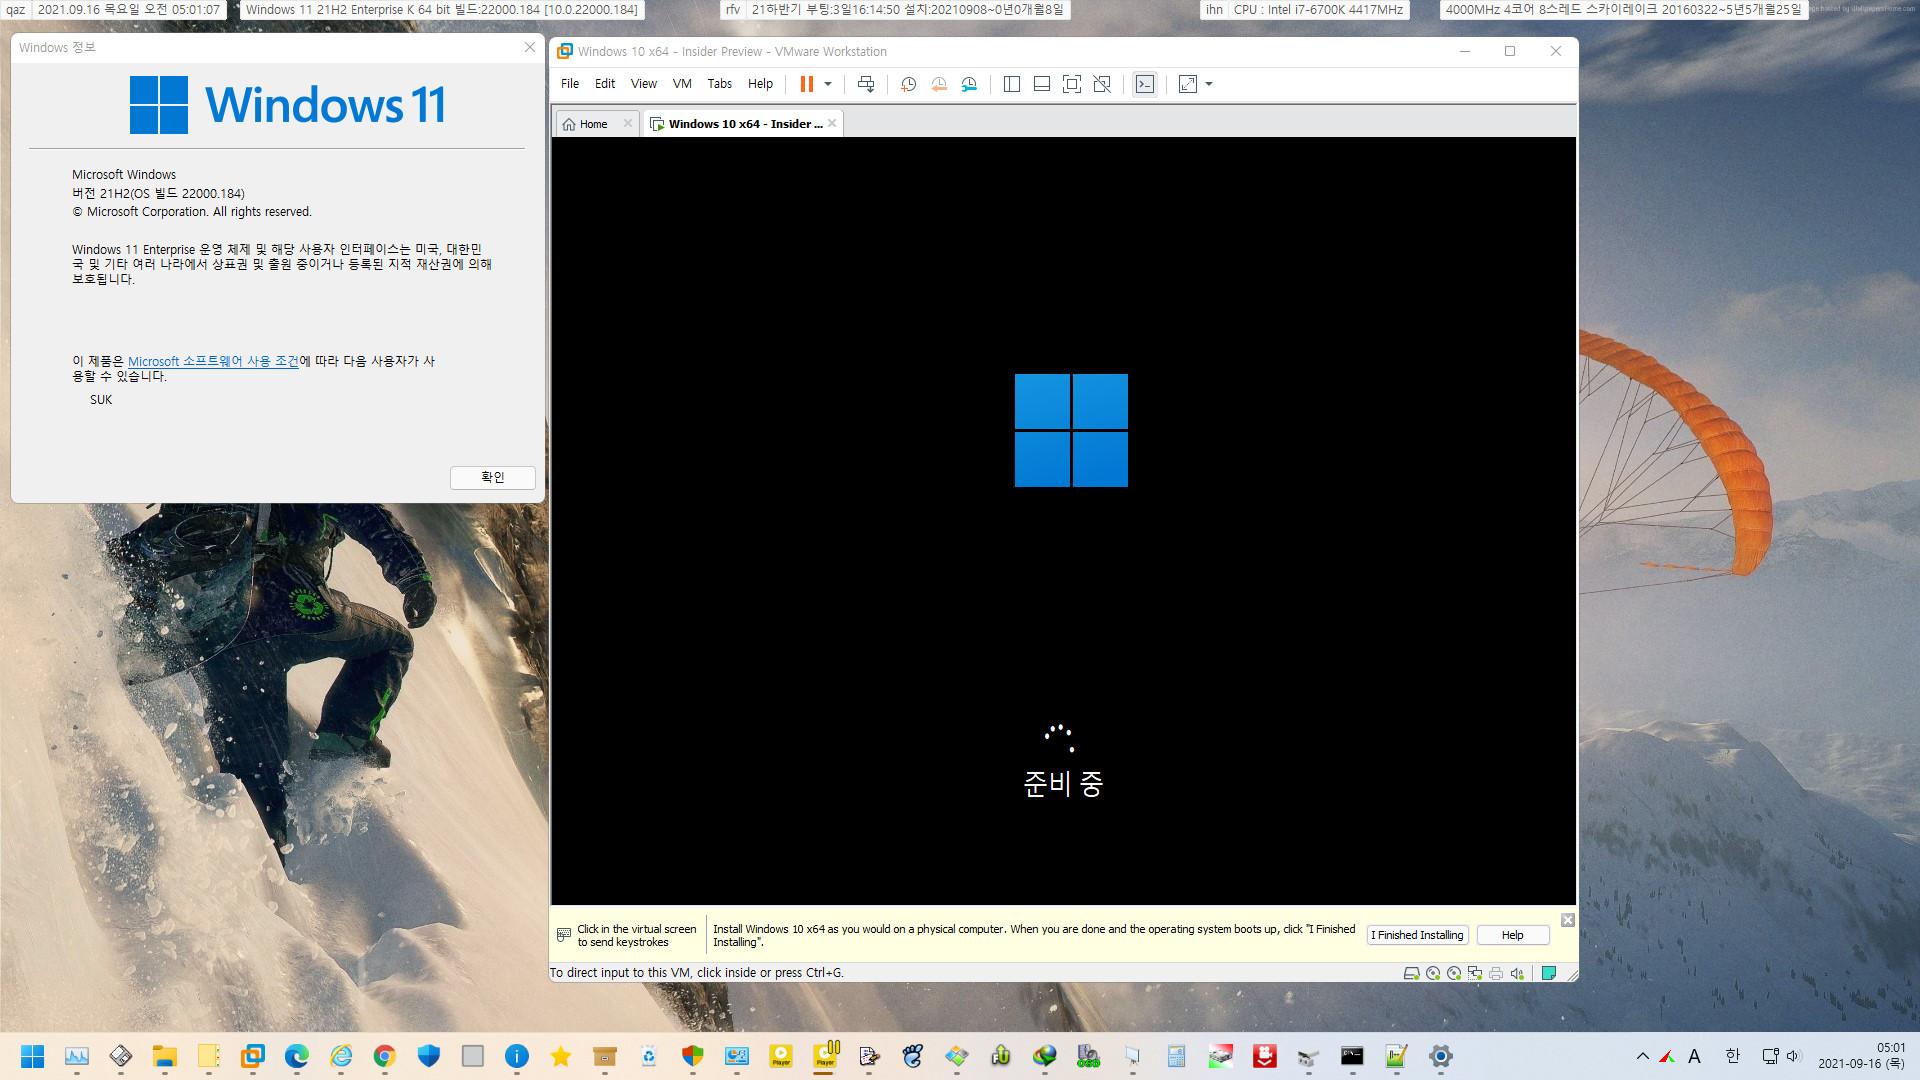 Windows 11 인사이더 프리뷰 - 버전 Dev (OS 빌드 22458.1000) 나왔네요 - 개발자 채널 - uup 사이트 2군데 전부 한국어 iso가 install.wim 단계에서 오류가 생겨서 윈도우 업데이트에서 uup 파일들 다운로드하여 iso 만드는데 성공했습니다 2021-09-16_050108.jpg